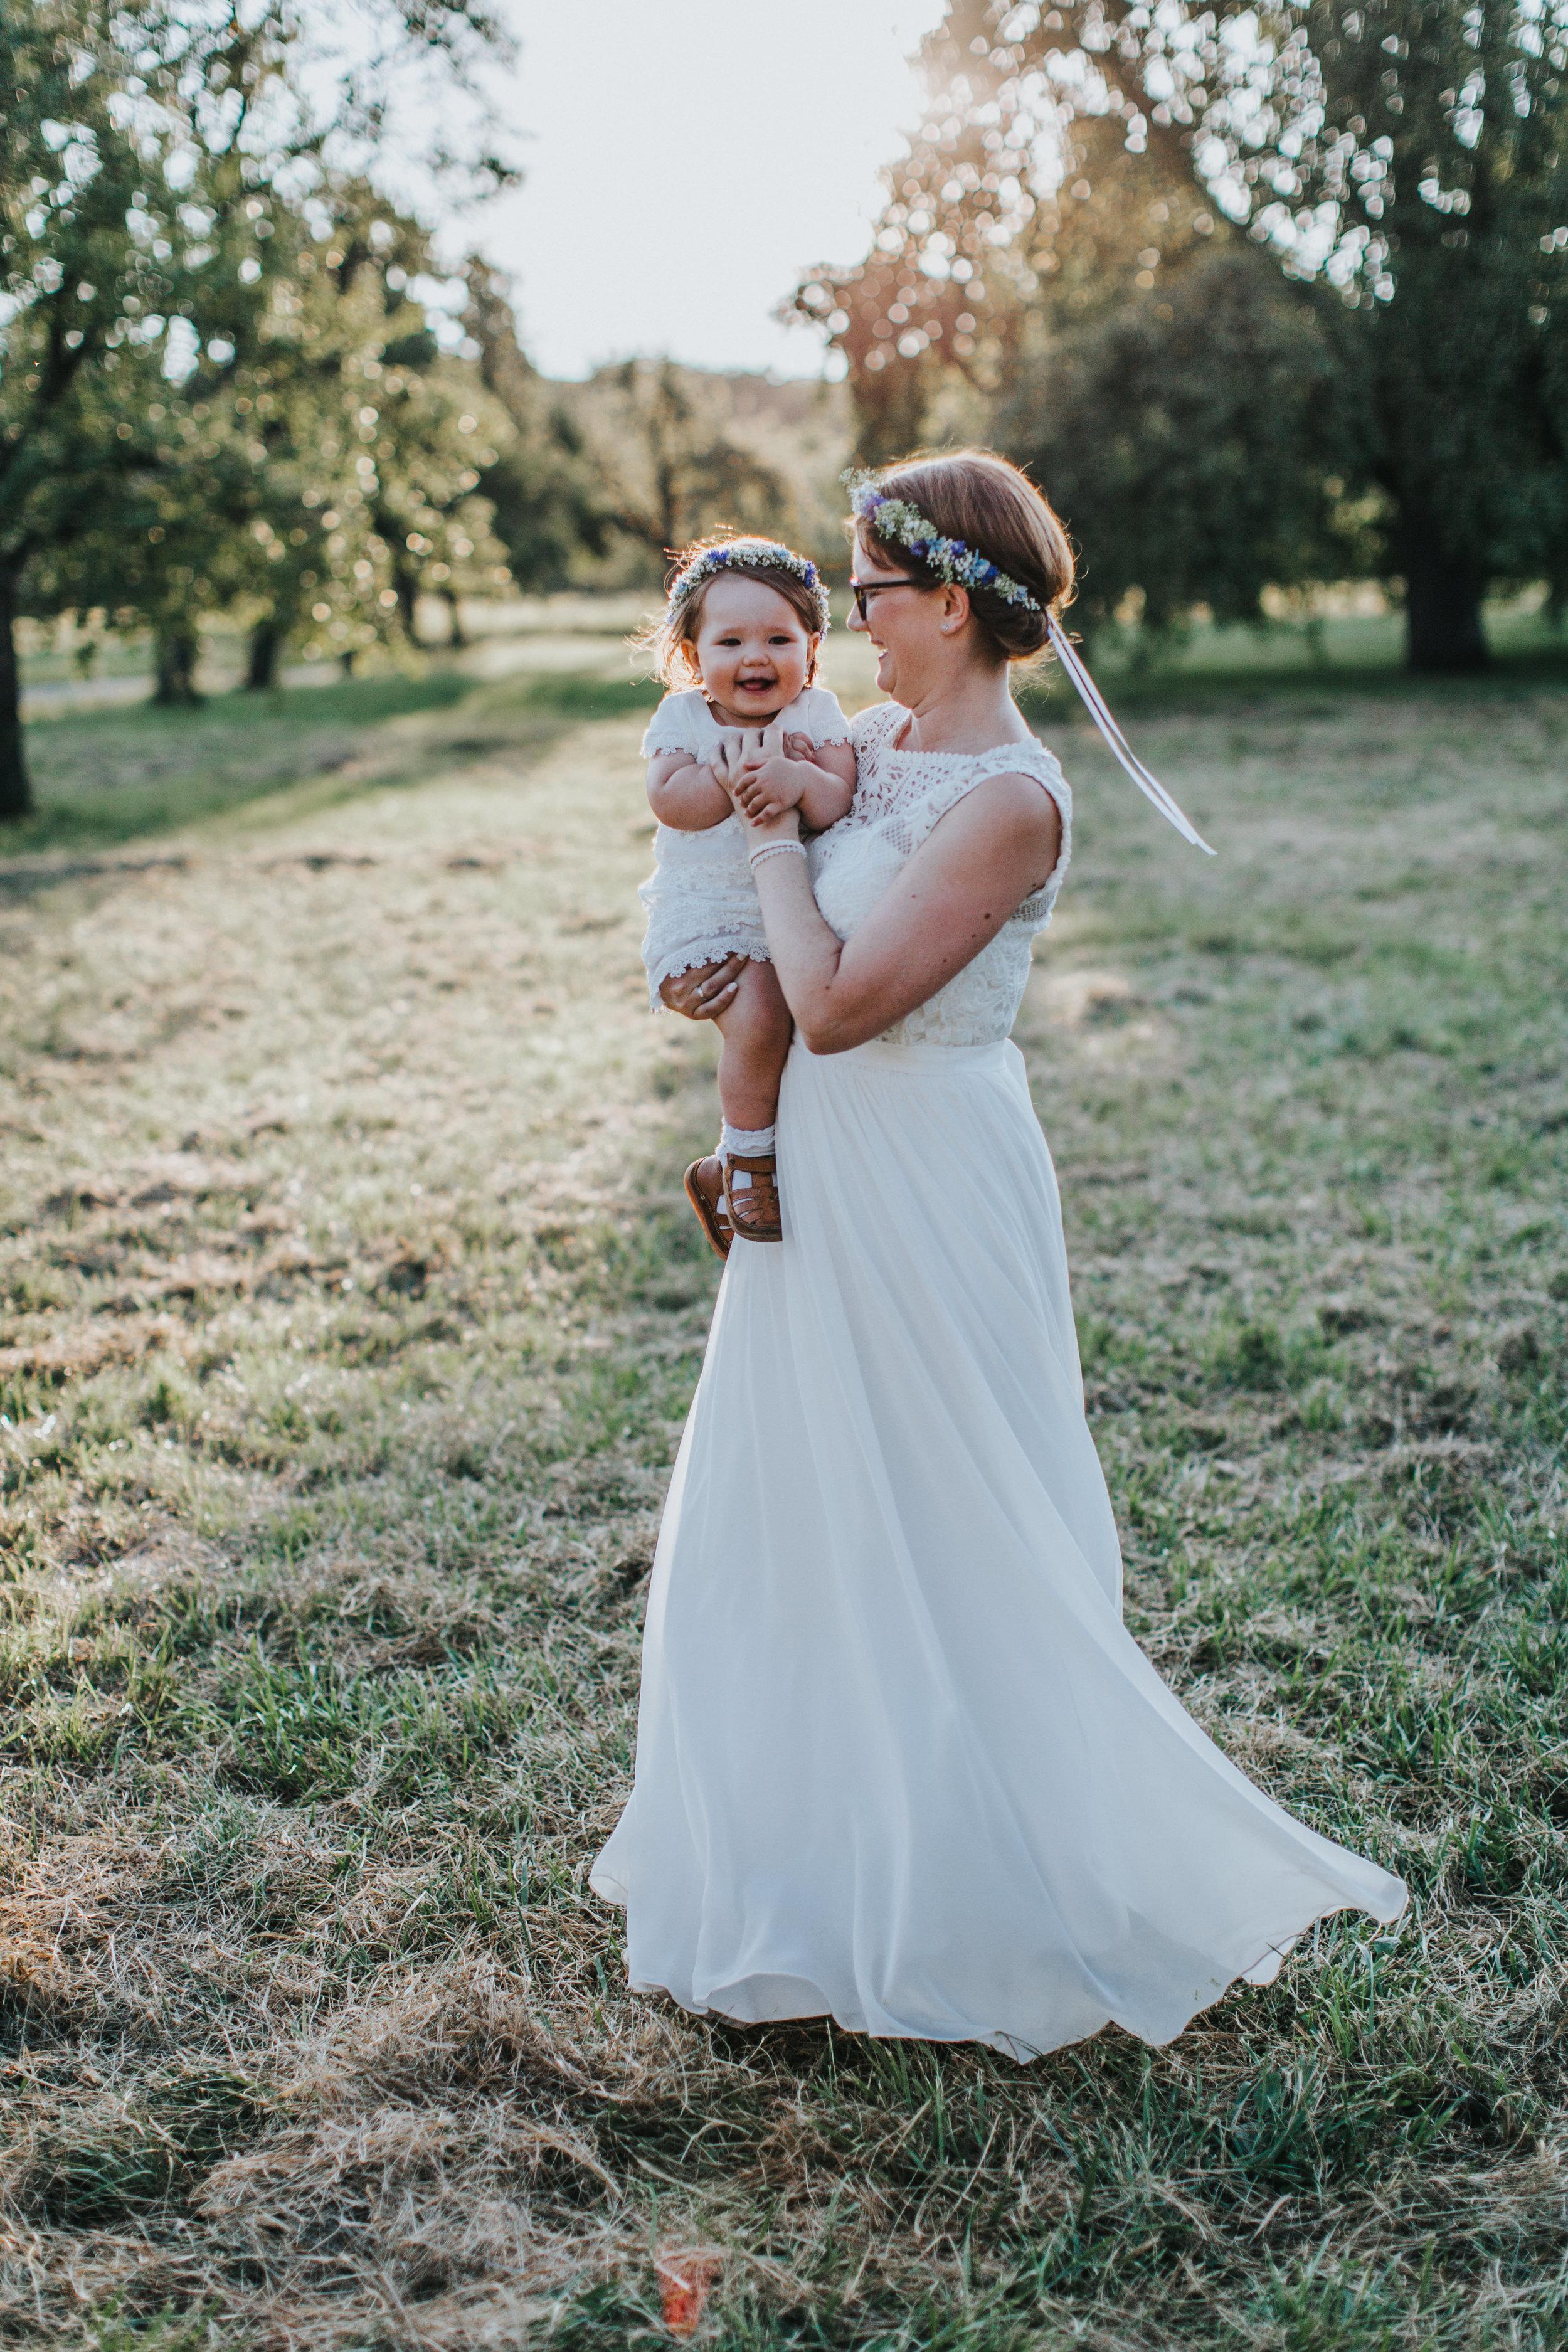 yessica-baur-fotografie-after-wedding-tübingen-097-9964.JPG